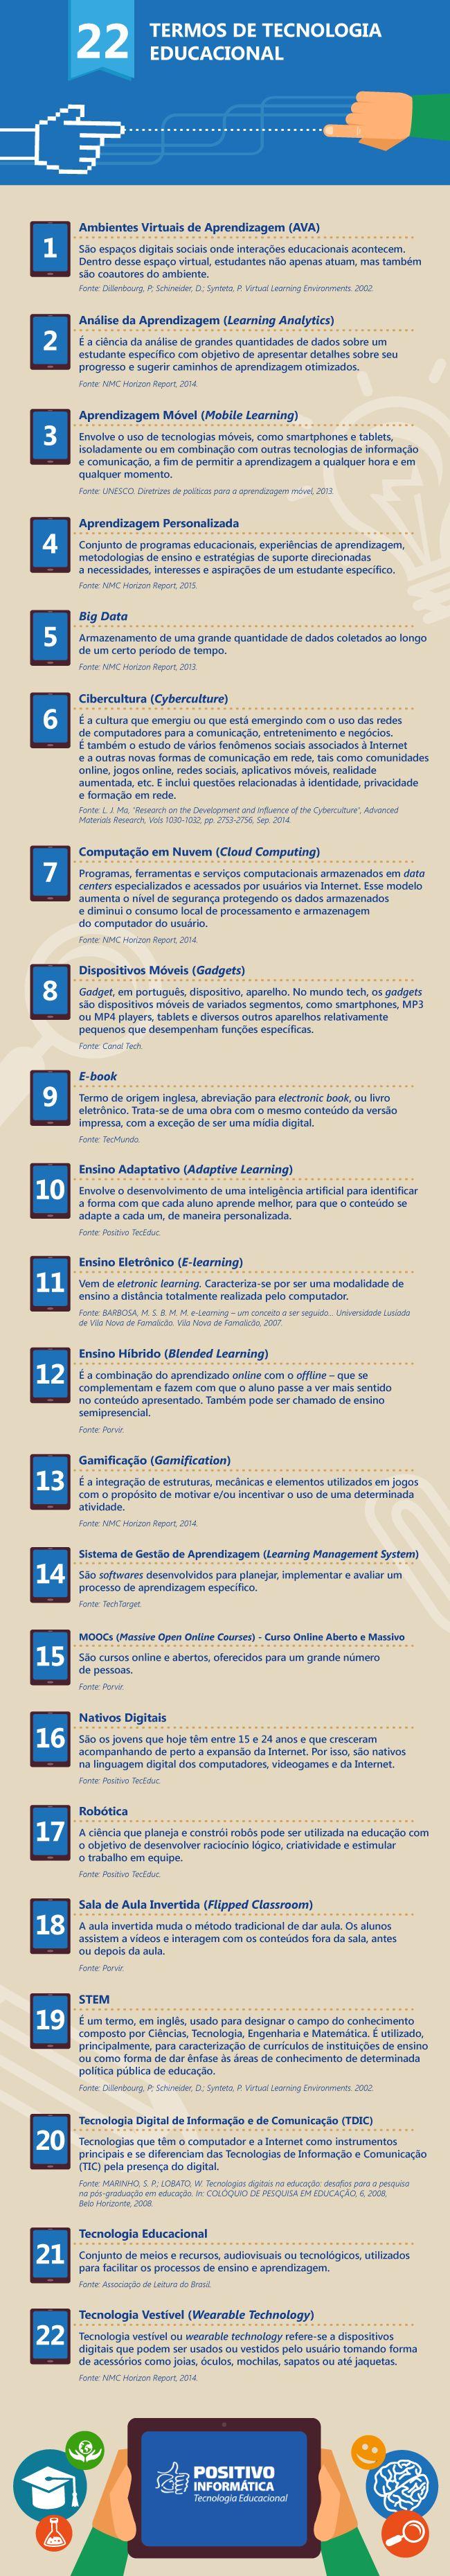 arte_Info_22TermosTecnologiaEducacional-6